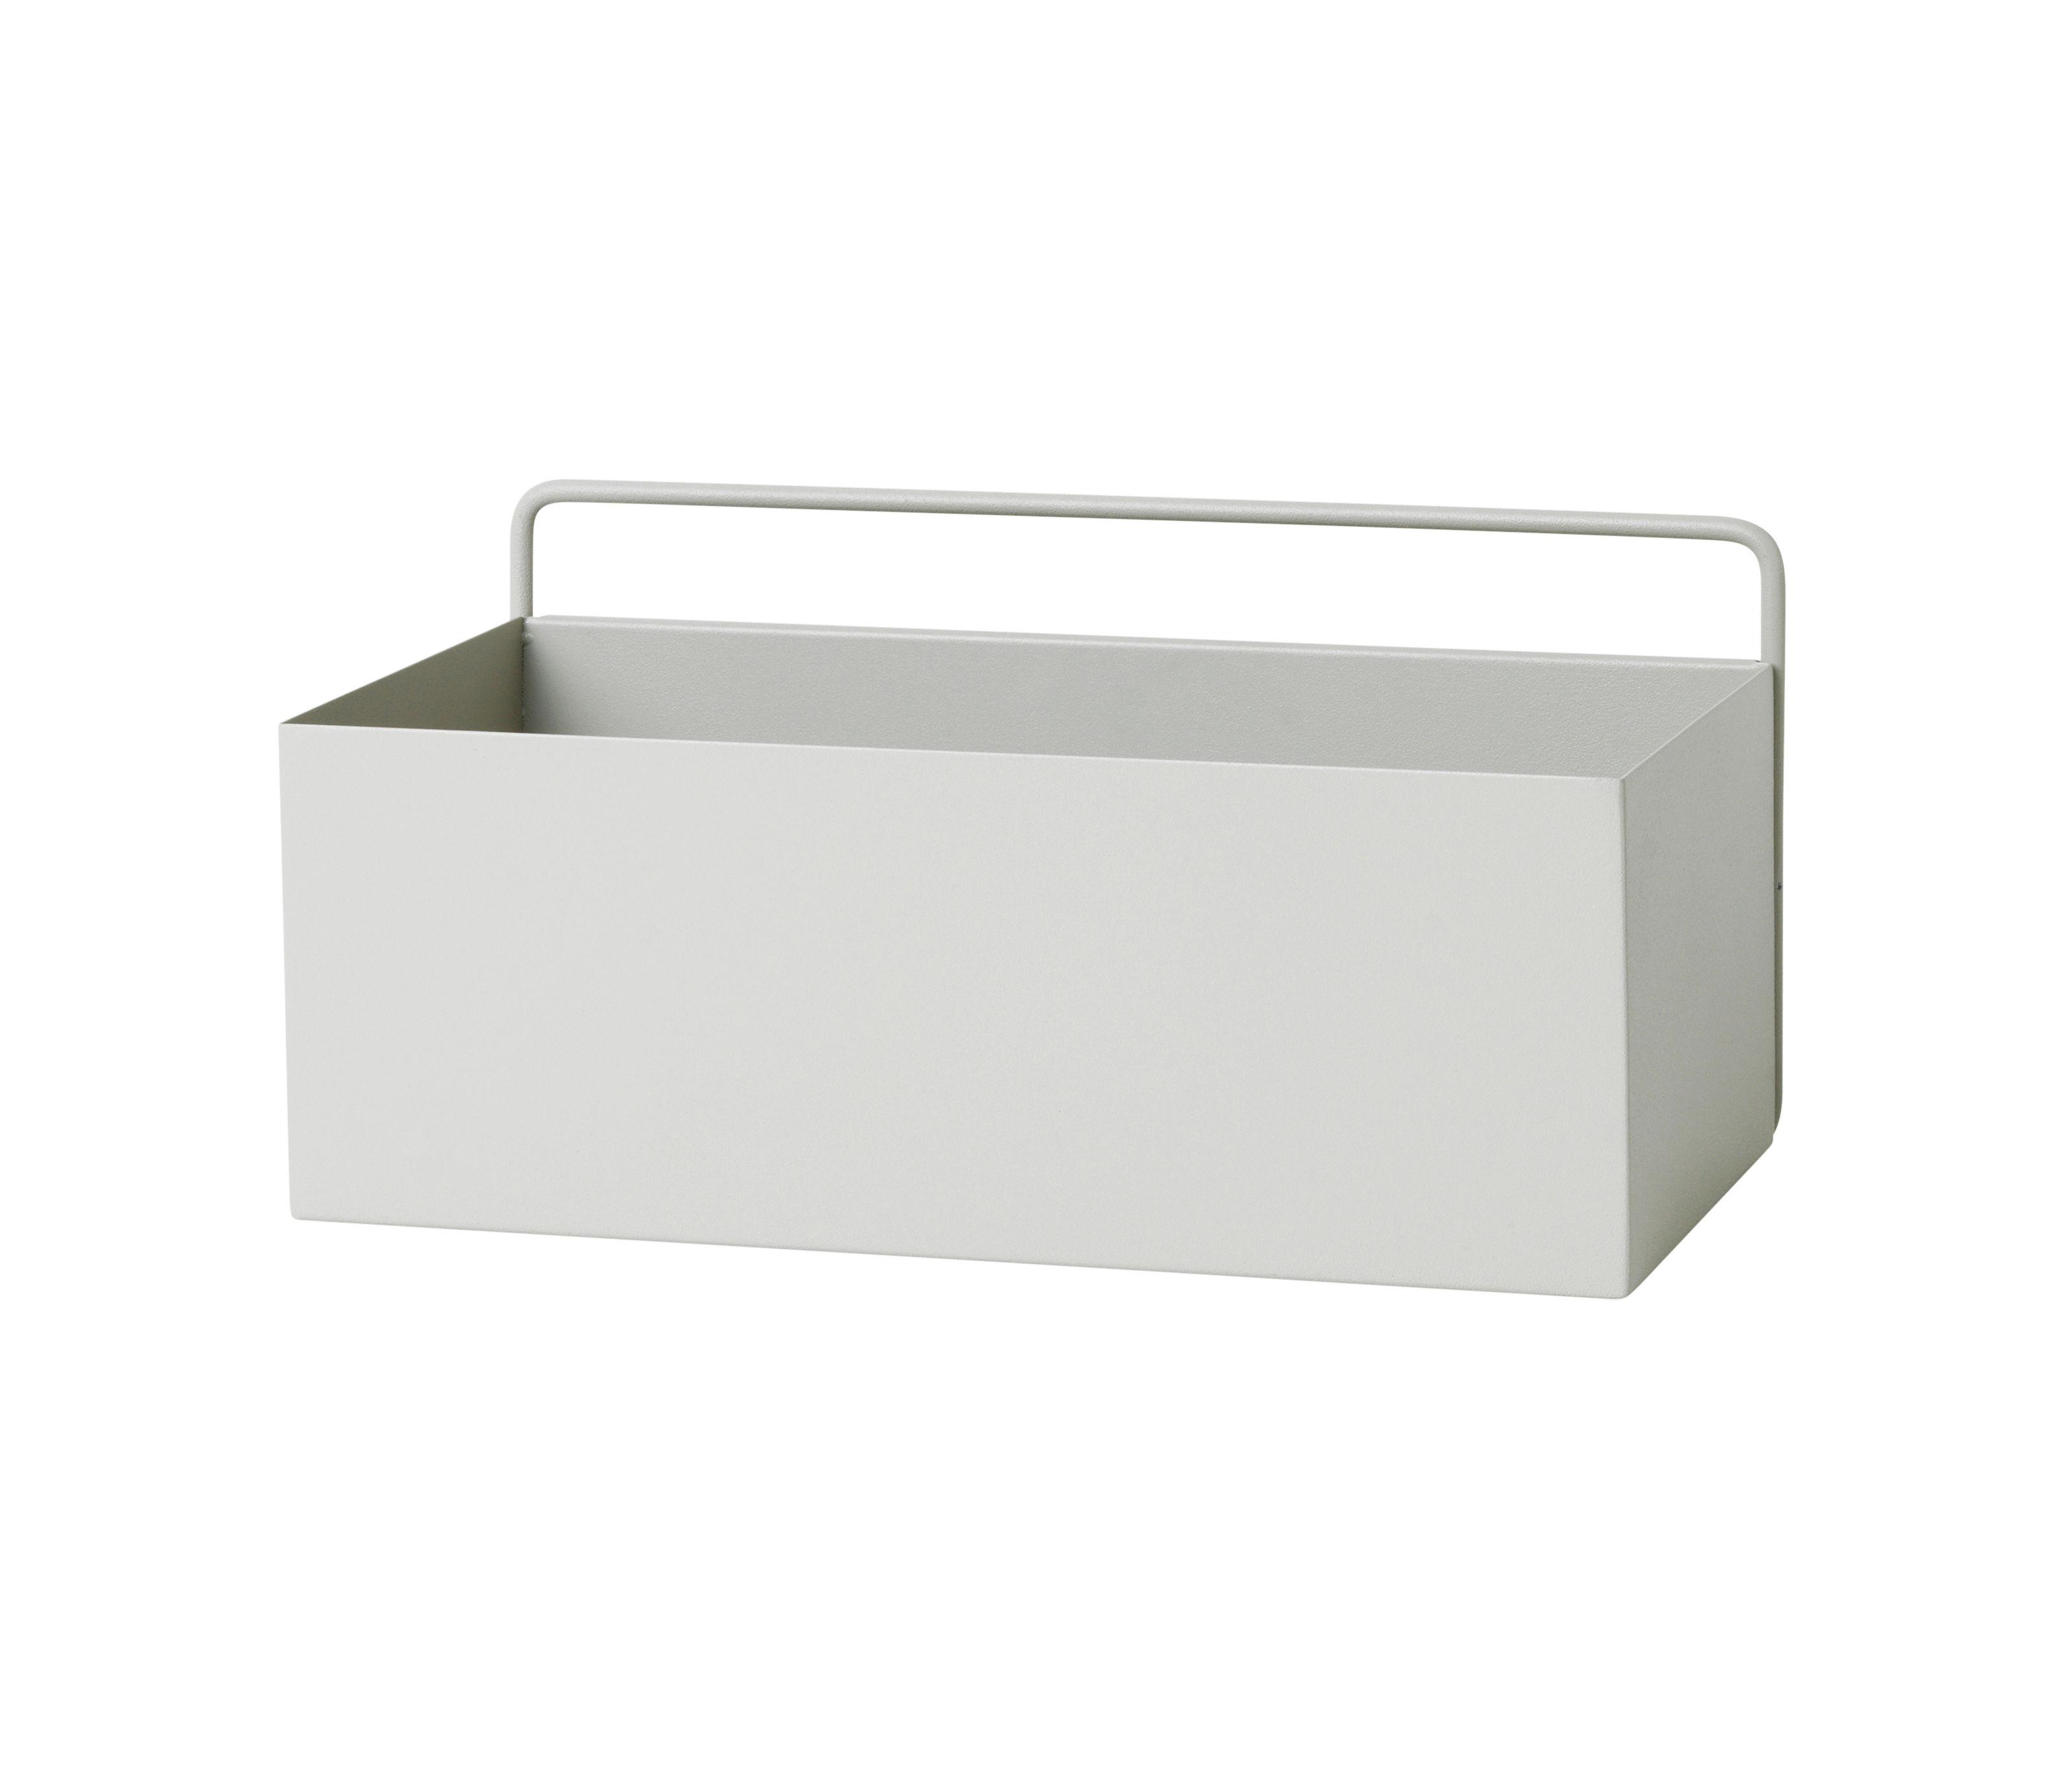 rectangle blumentopf l 30 6 cm x h 15 6 cm hellgrau by ferm living made in design. Black Bedroom Furniture Sets. Home Design Ideas